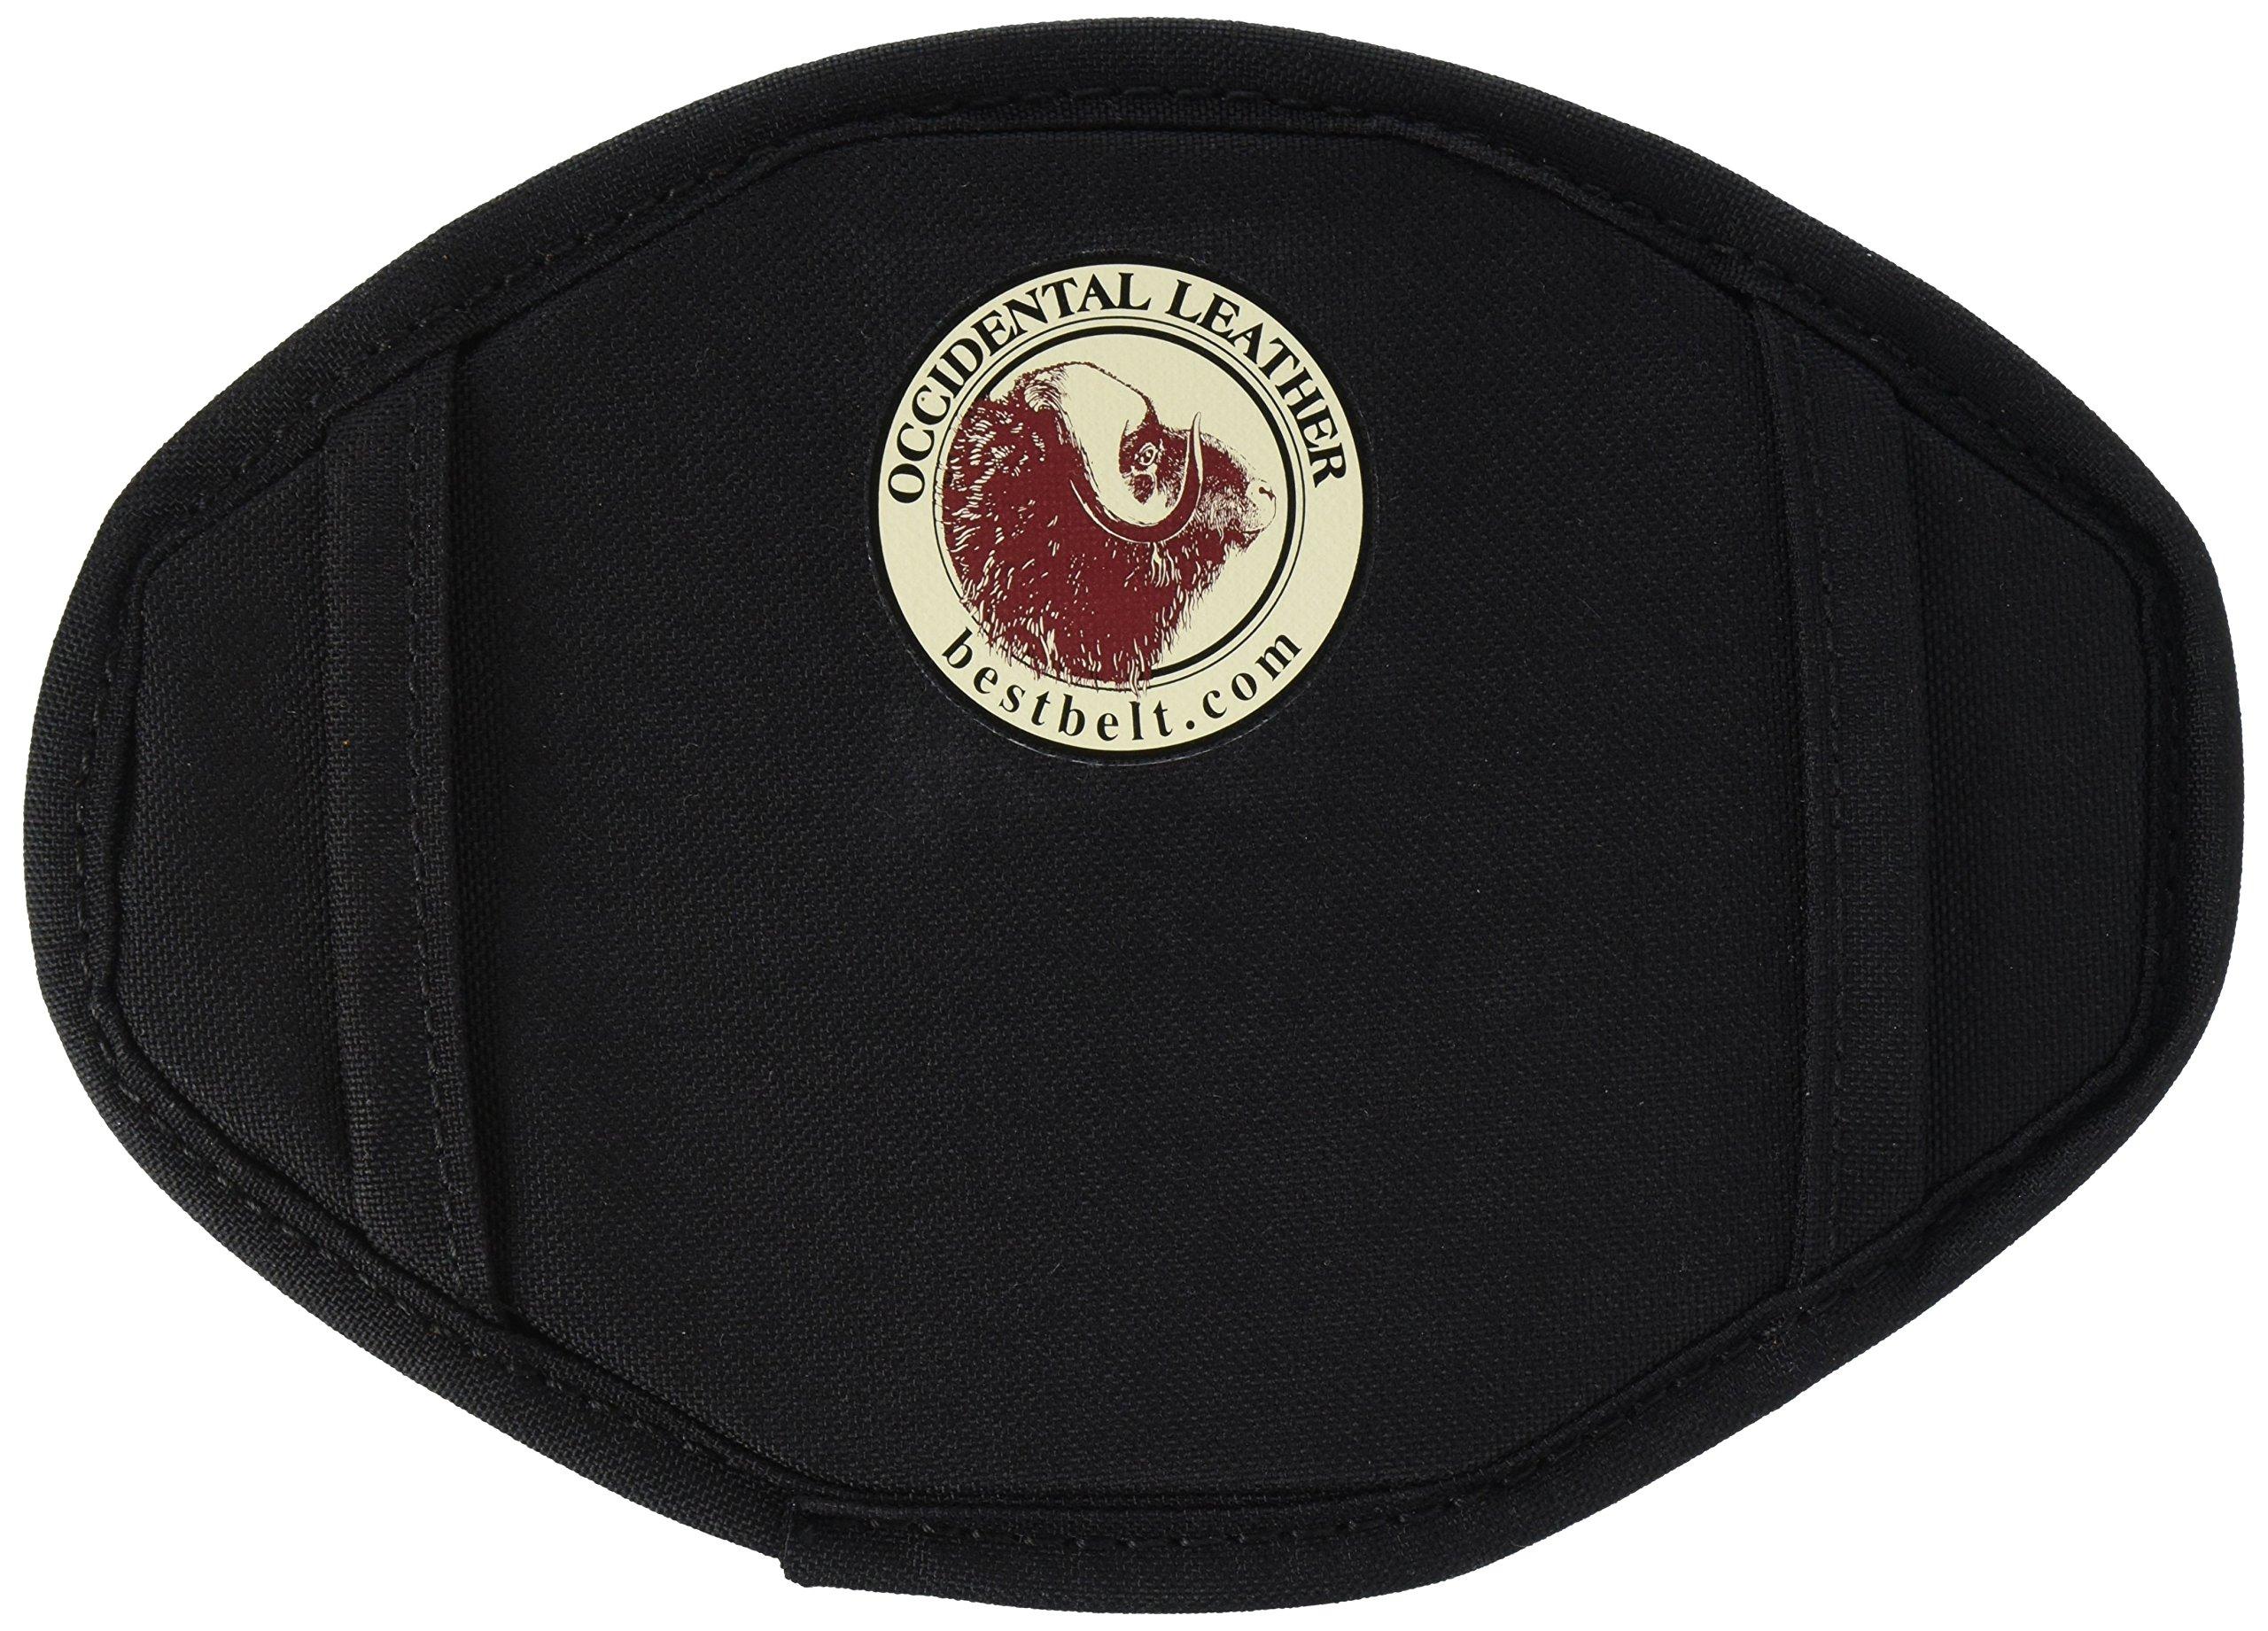 Occidental Leather 9005 Belt Buddy